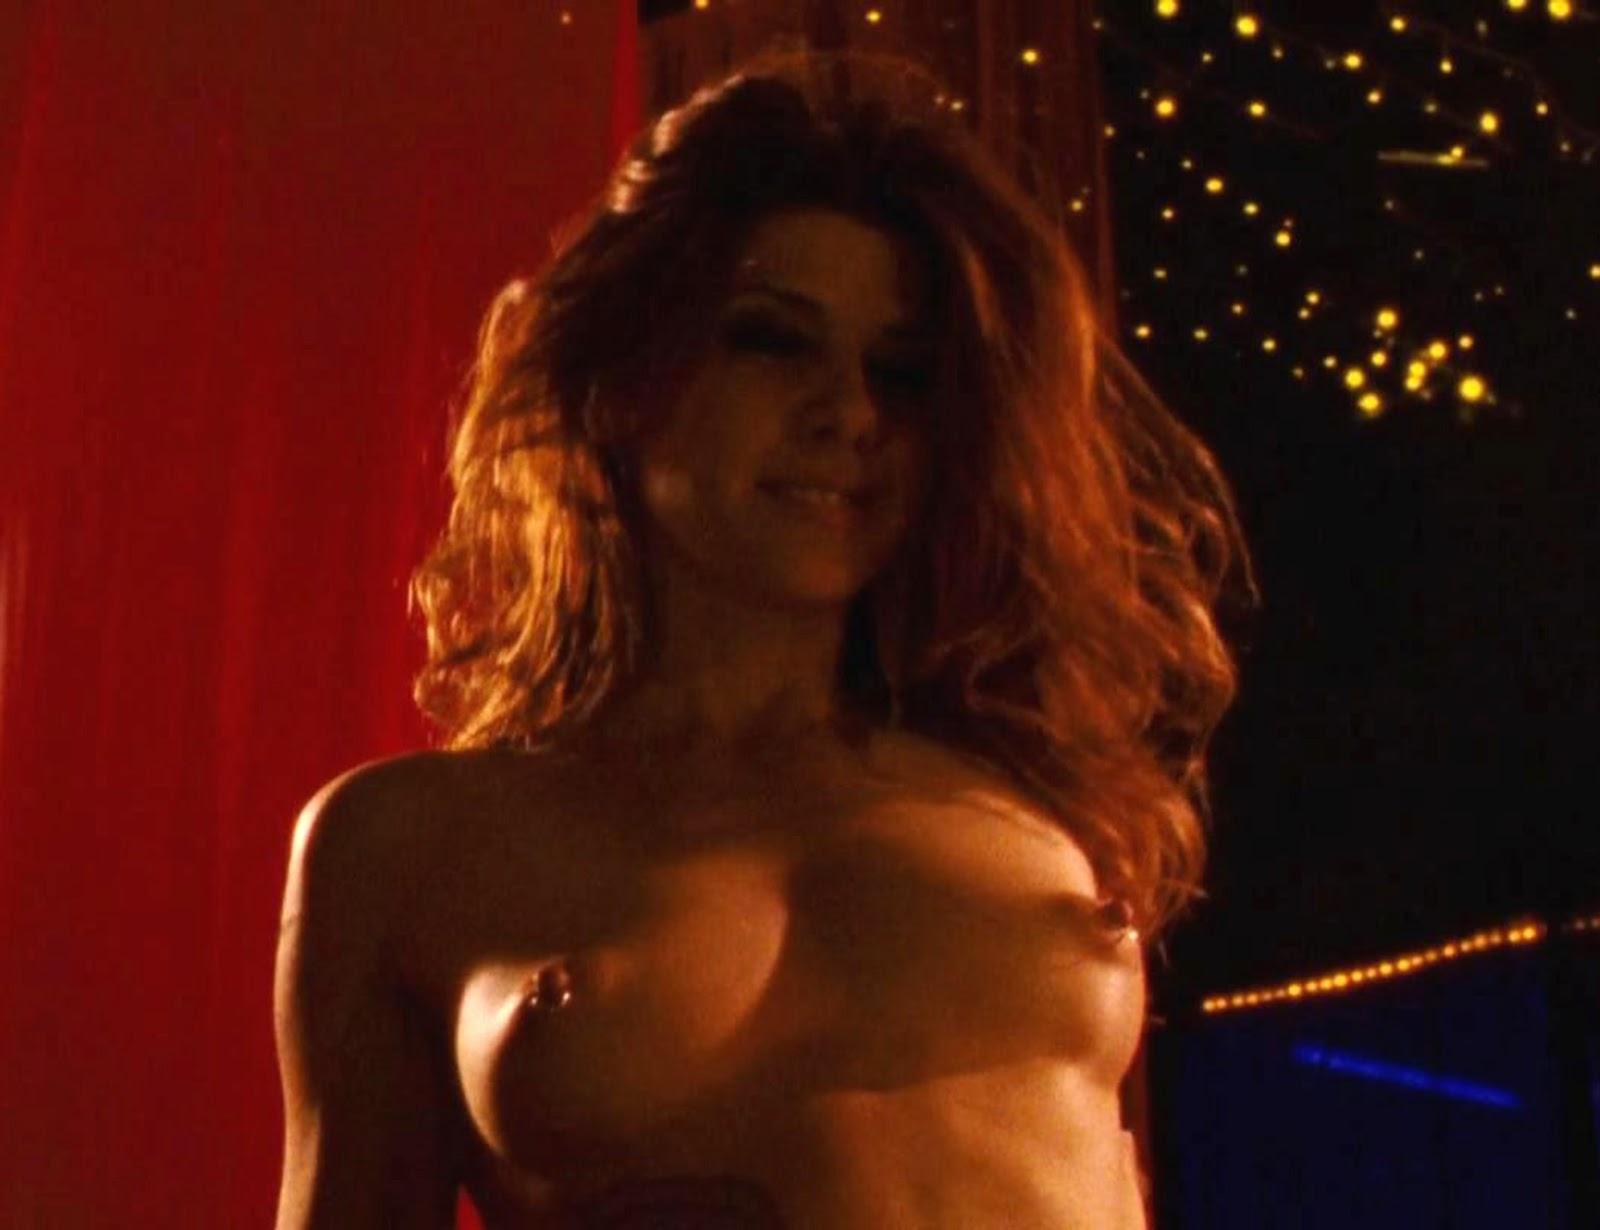 Marisa Tomei Nude Pics 21